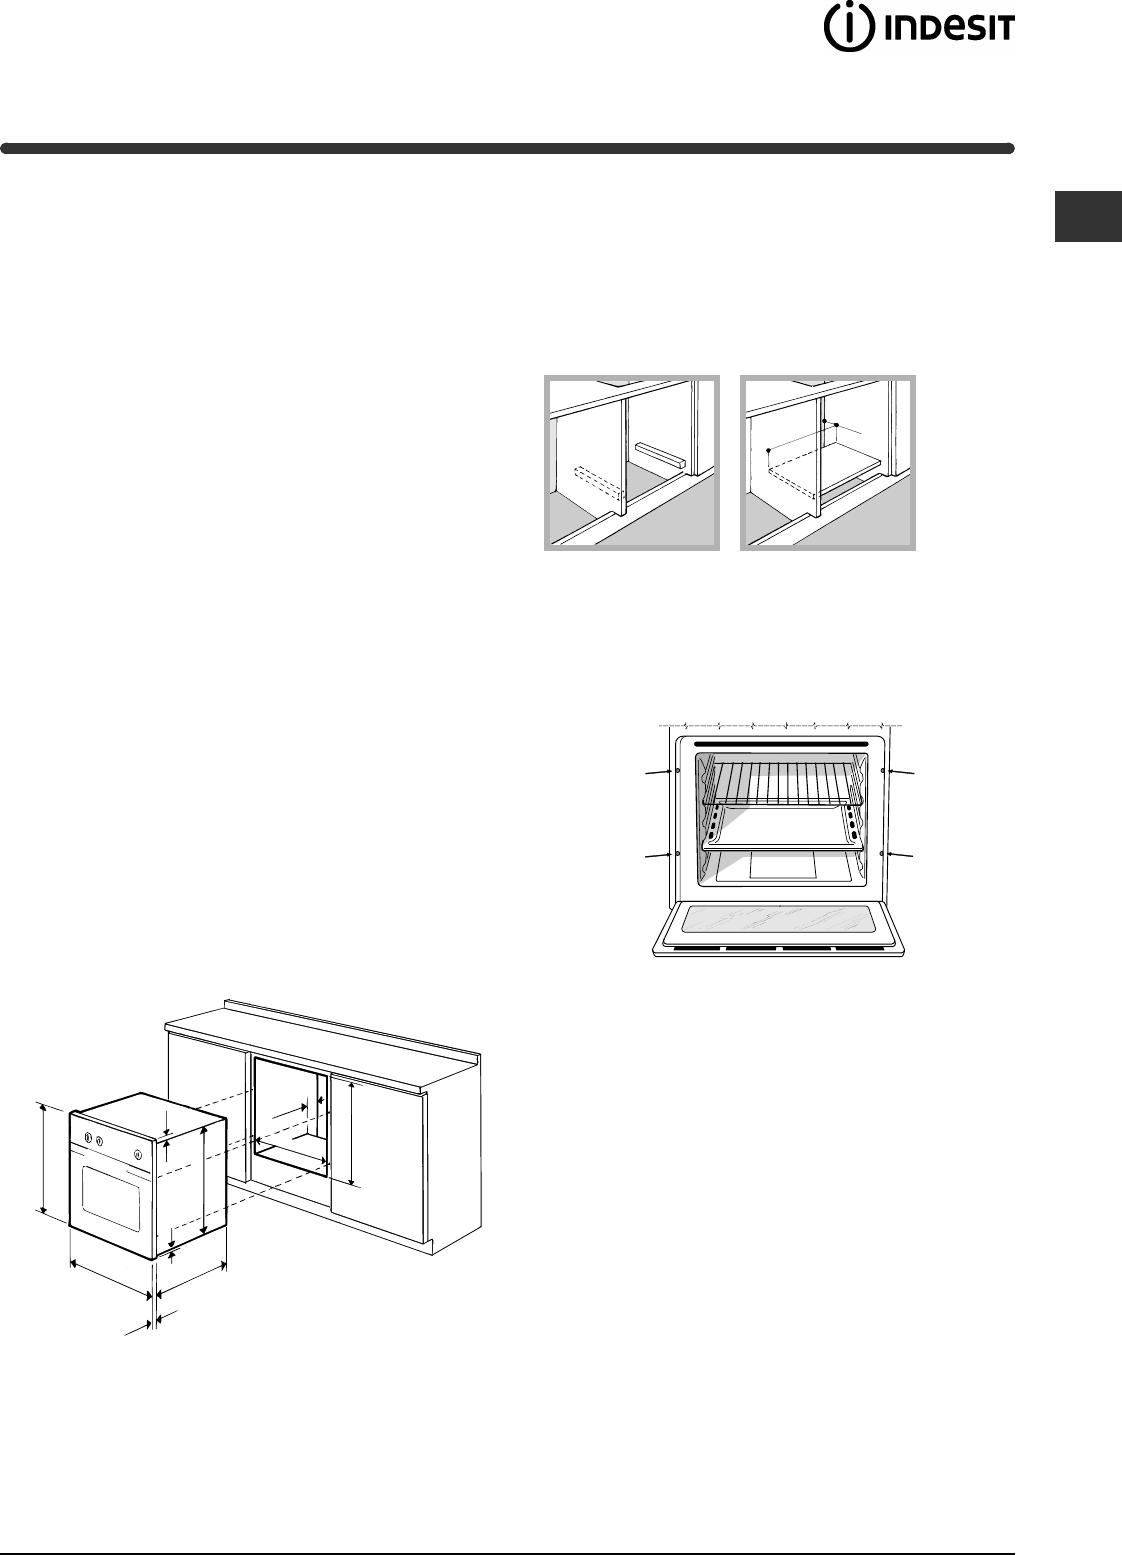 Handleiding Indesit FI 20.B IX (pagina 13 van 72) (Nederlands)